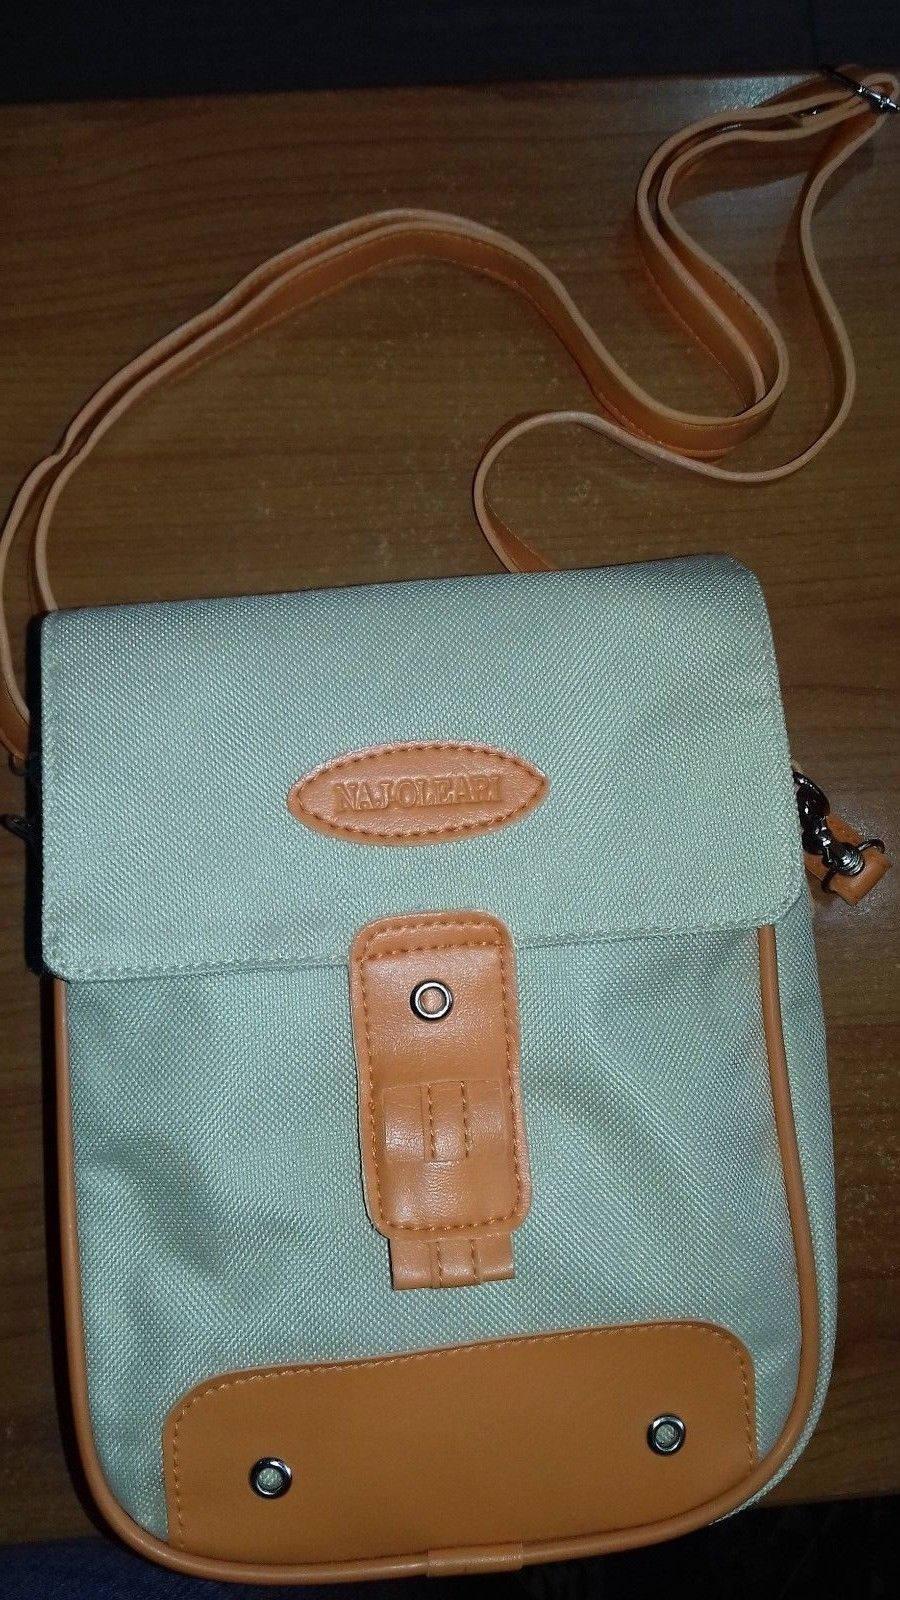 e5086c6221cd Vintage 90s NAJ - OLEARI Handbag Shoulder bag bags   purses Shoulder Bag